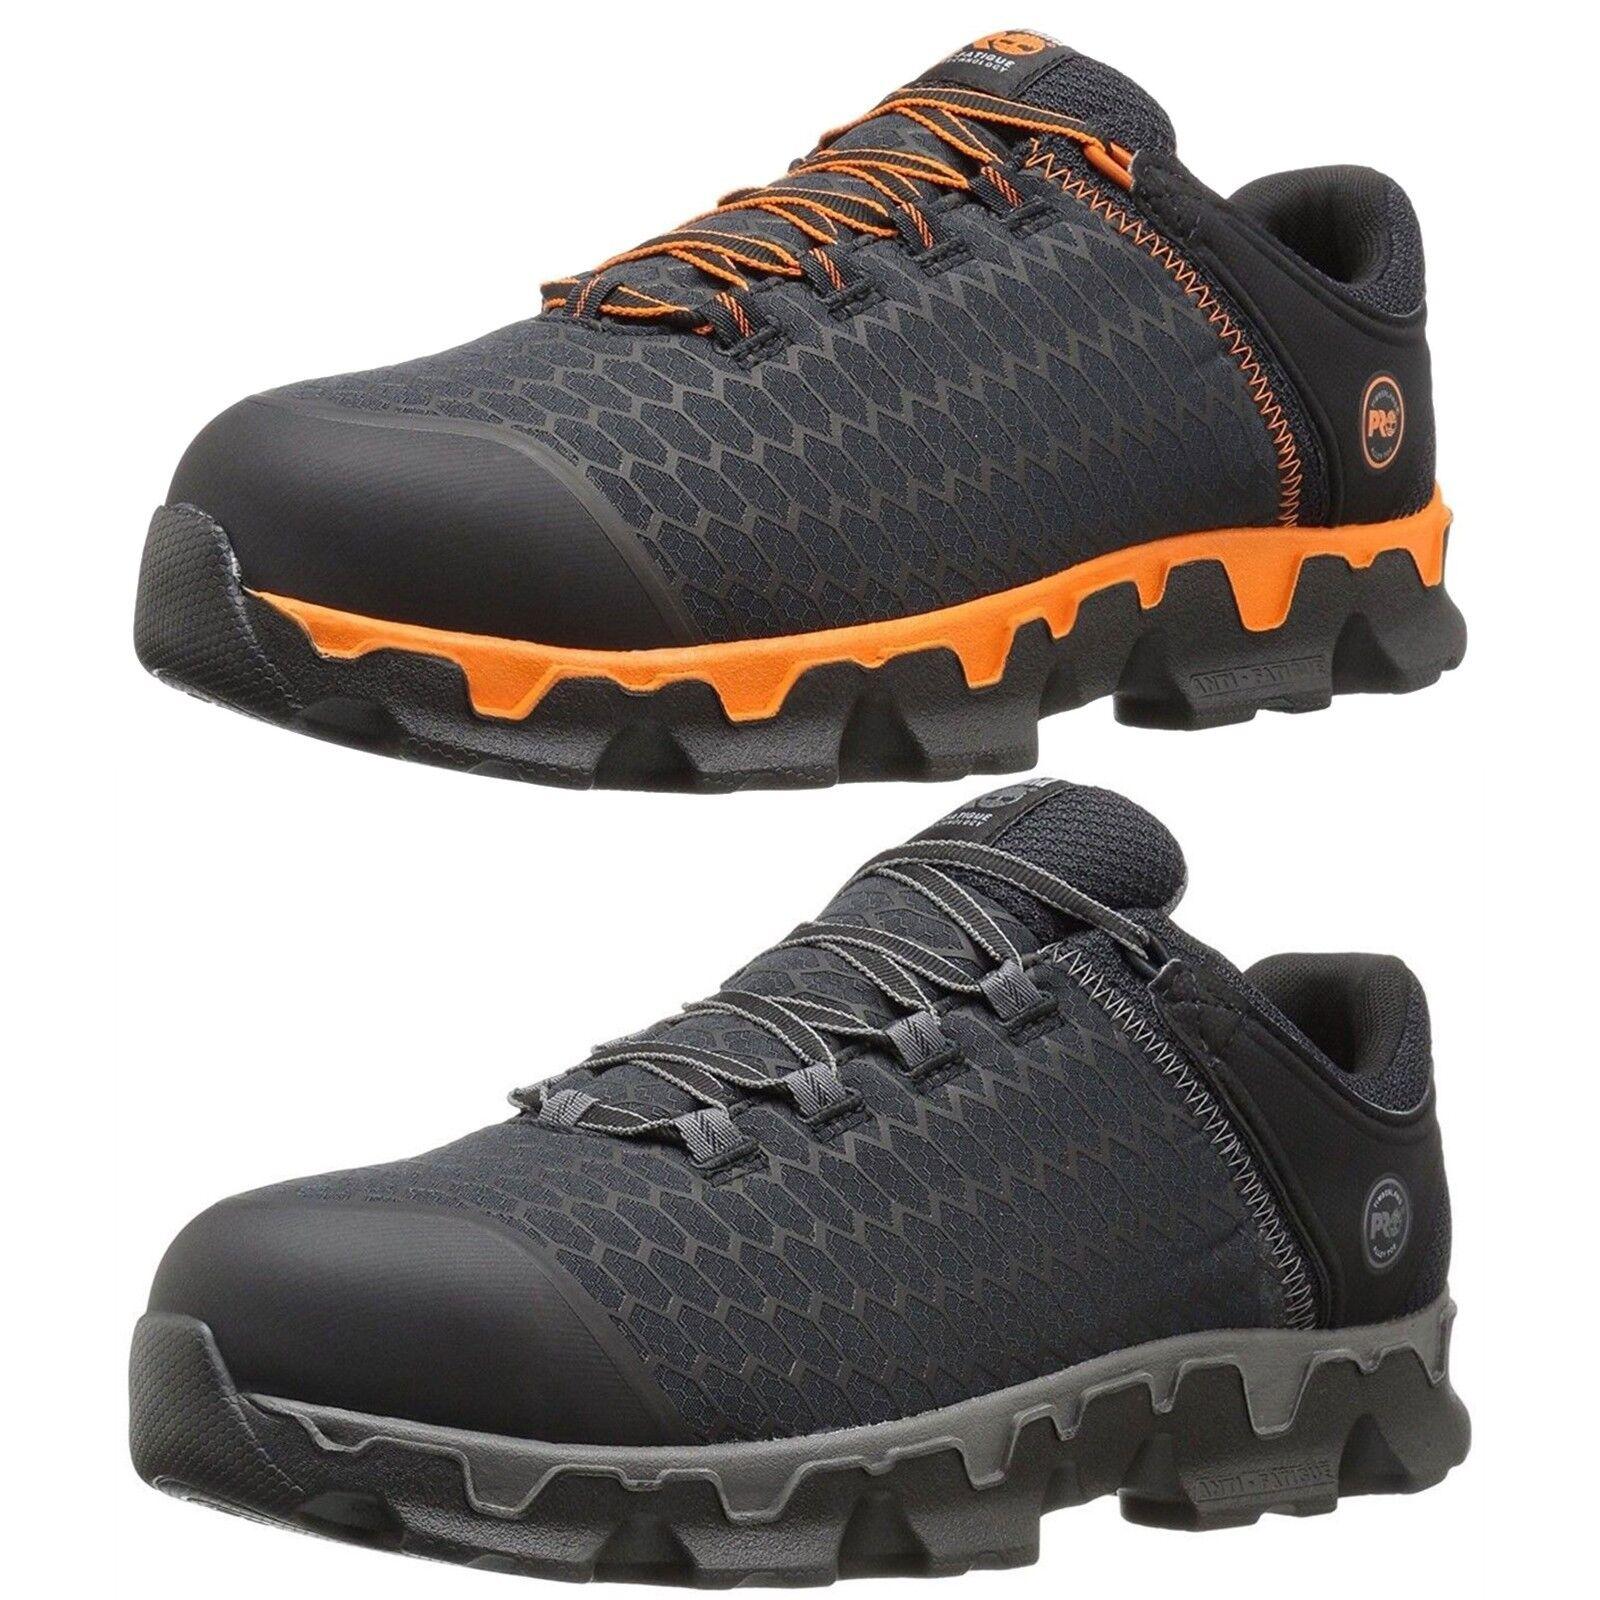 Timberland PRO Men's Powertrain Sport Alloy Toe Industrial-Construction Boots